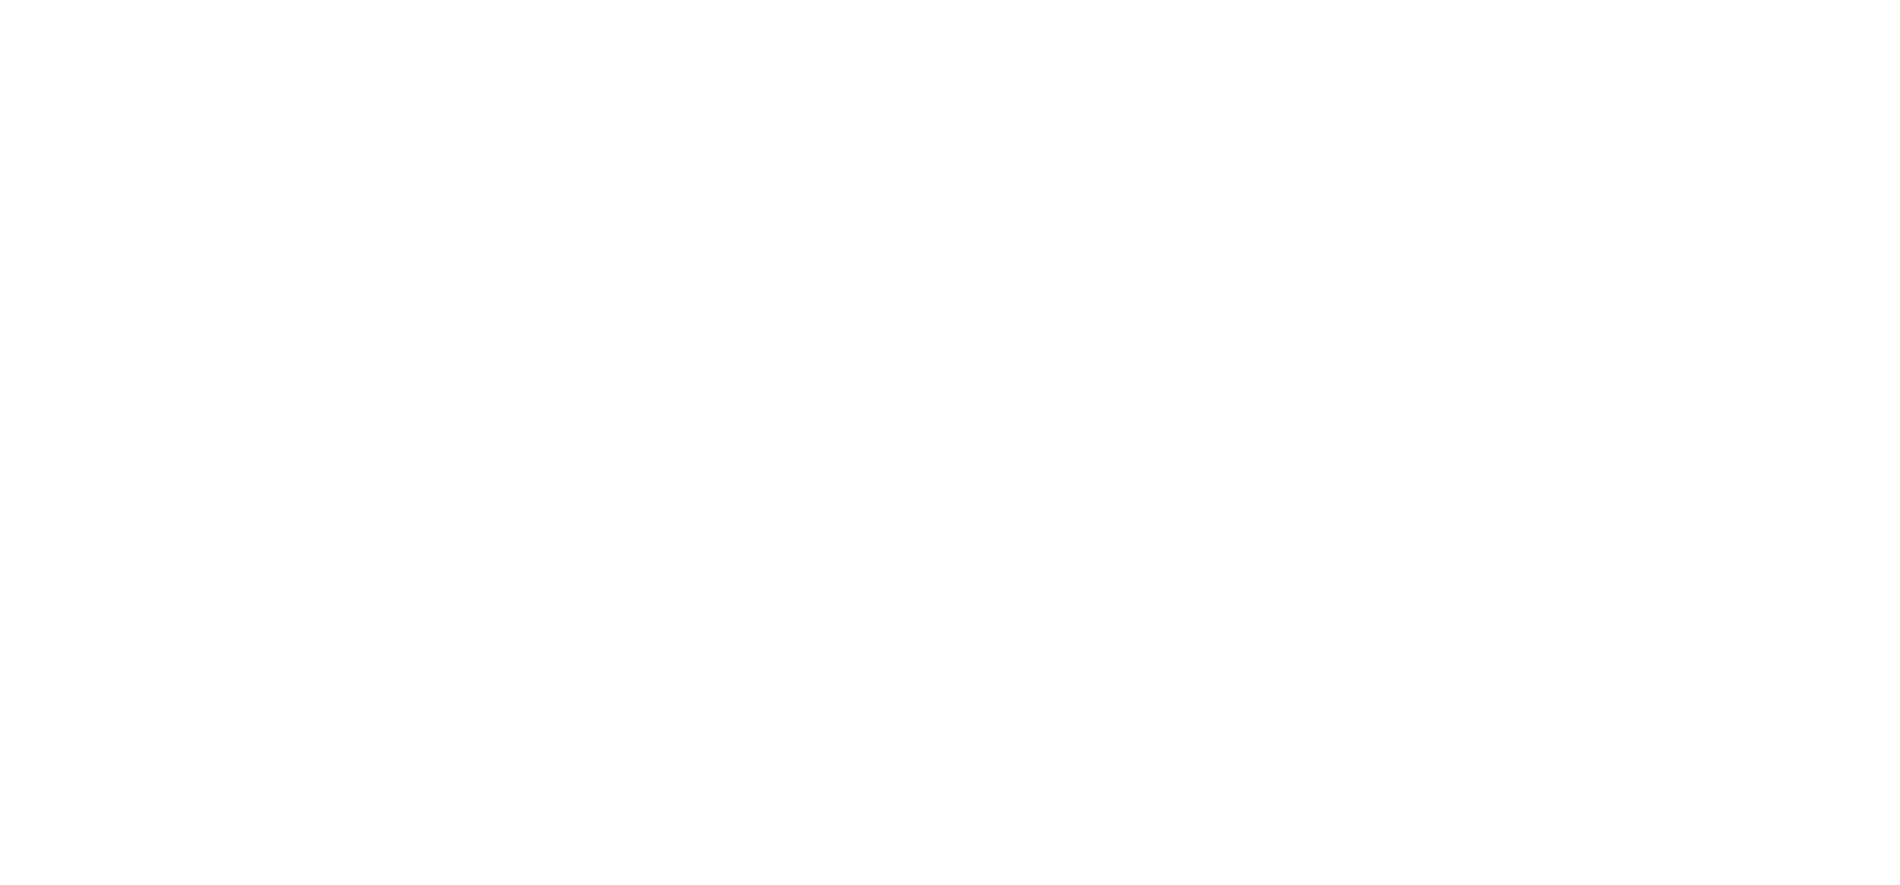 Slide invis